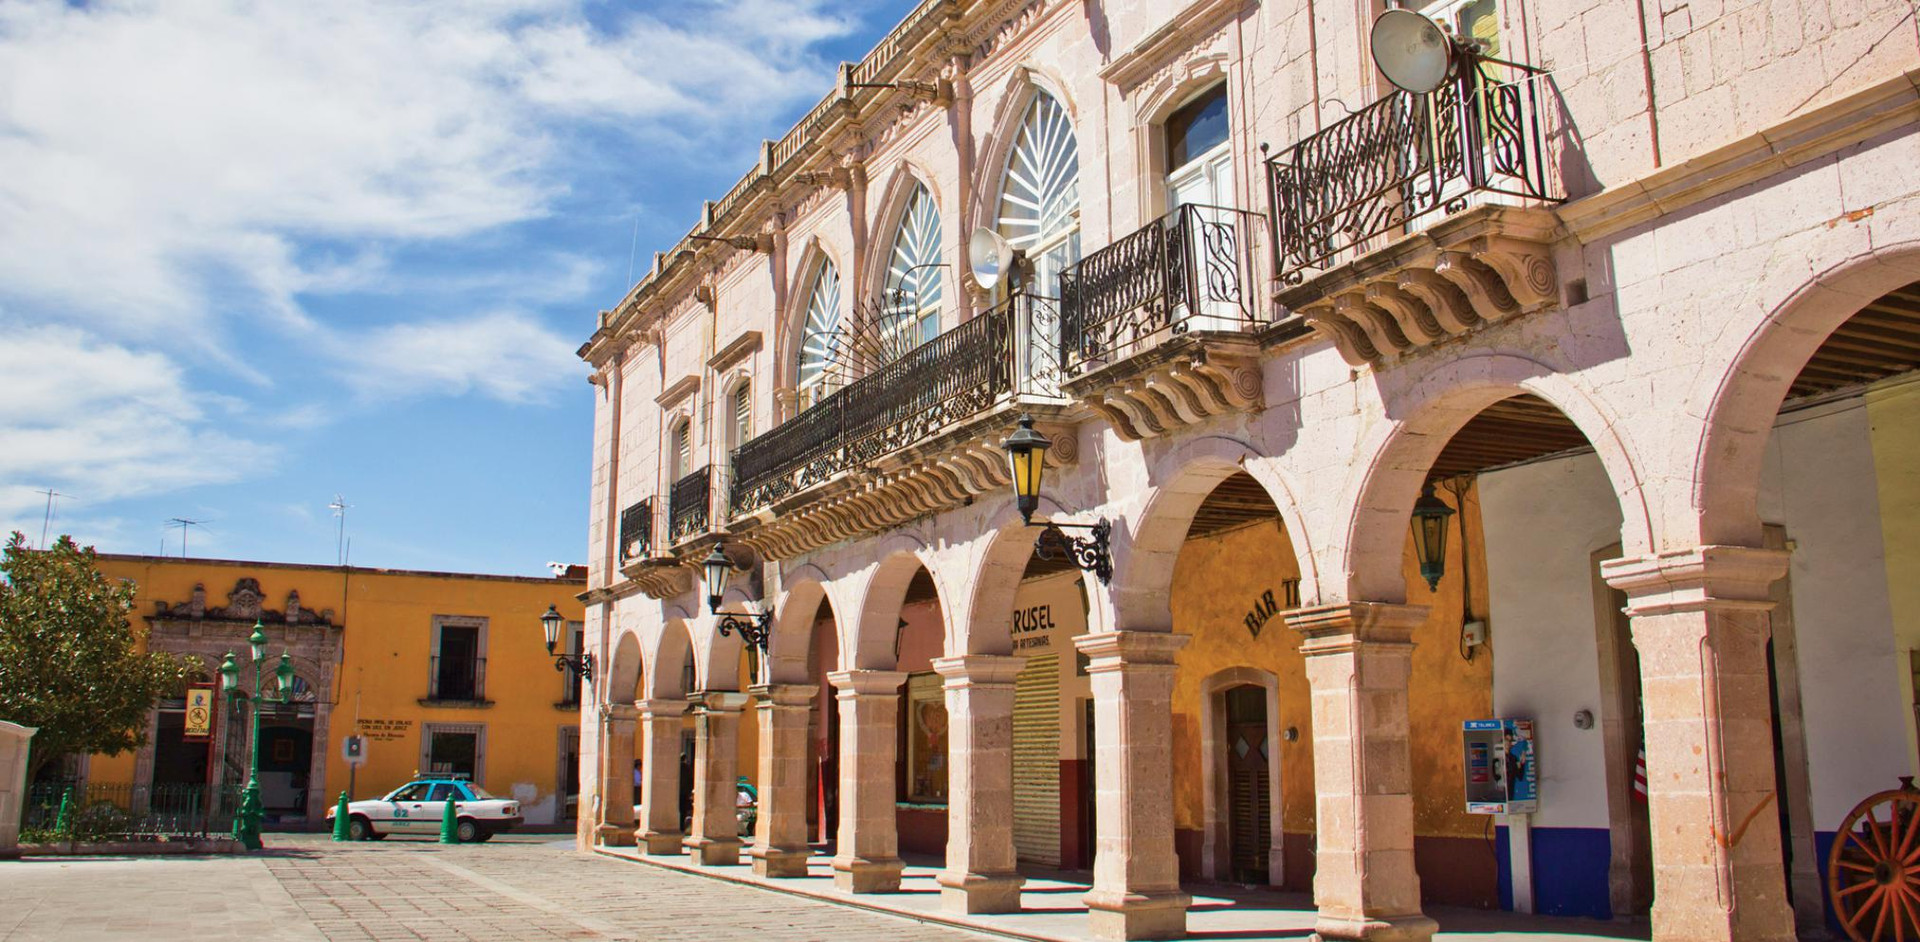 2675_zacatecas_destinos-principales_jere